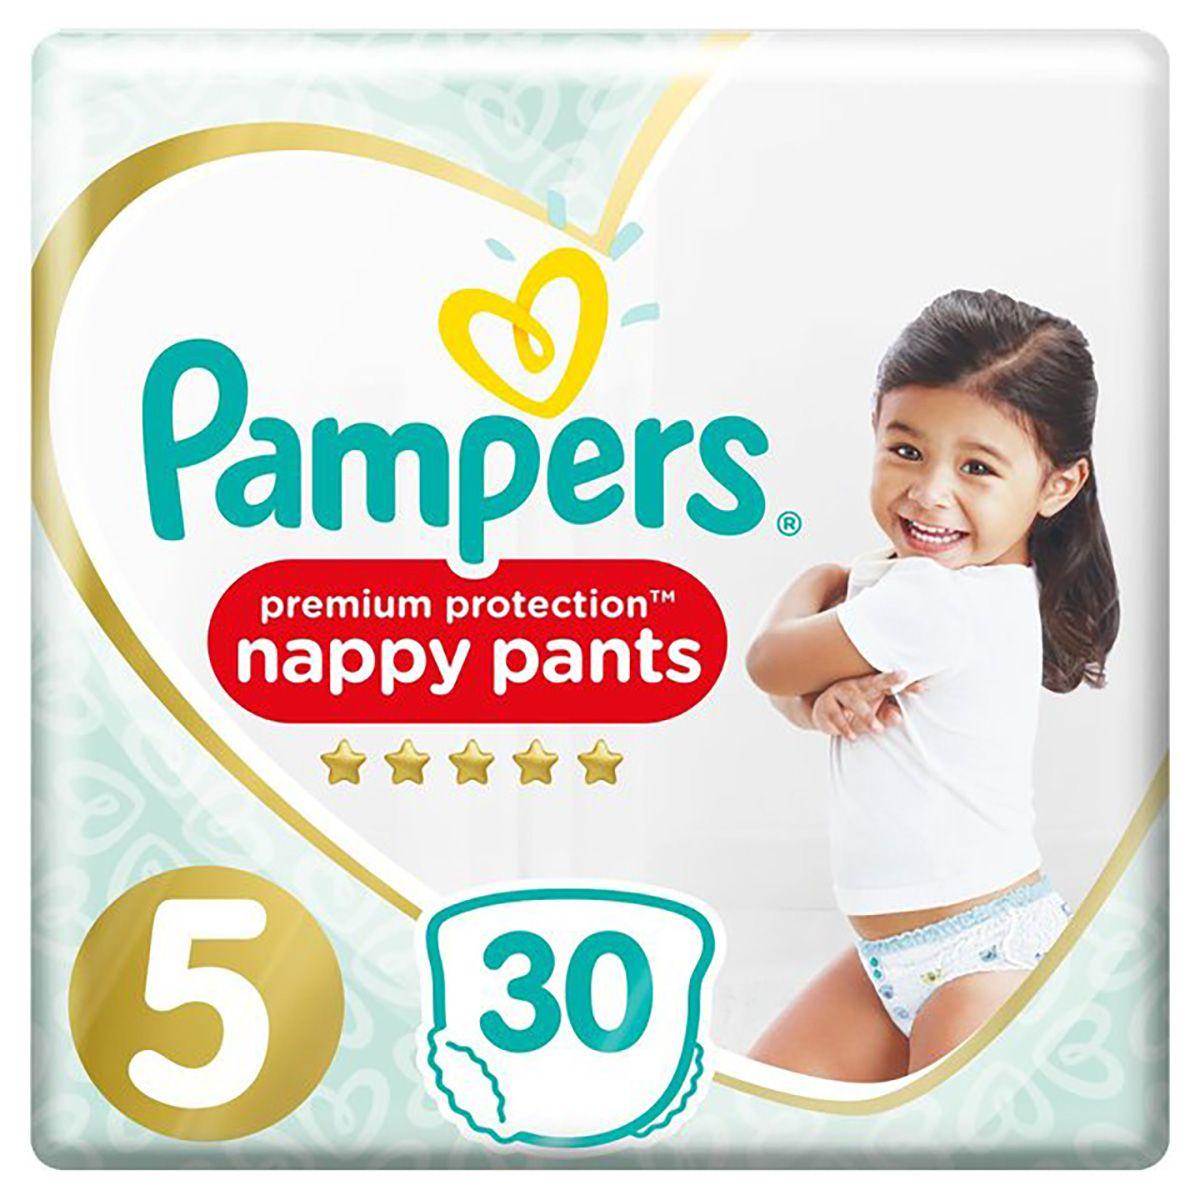 Pampers Premium Protection Nappy Pant Diaper - Size 5 - 30pcs